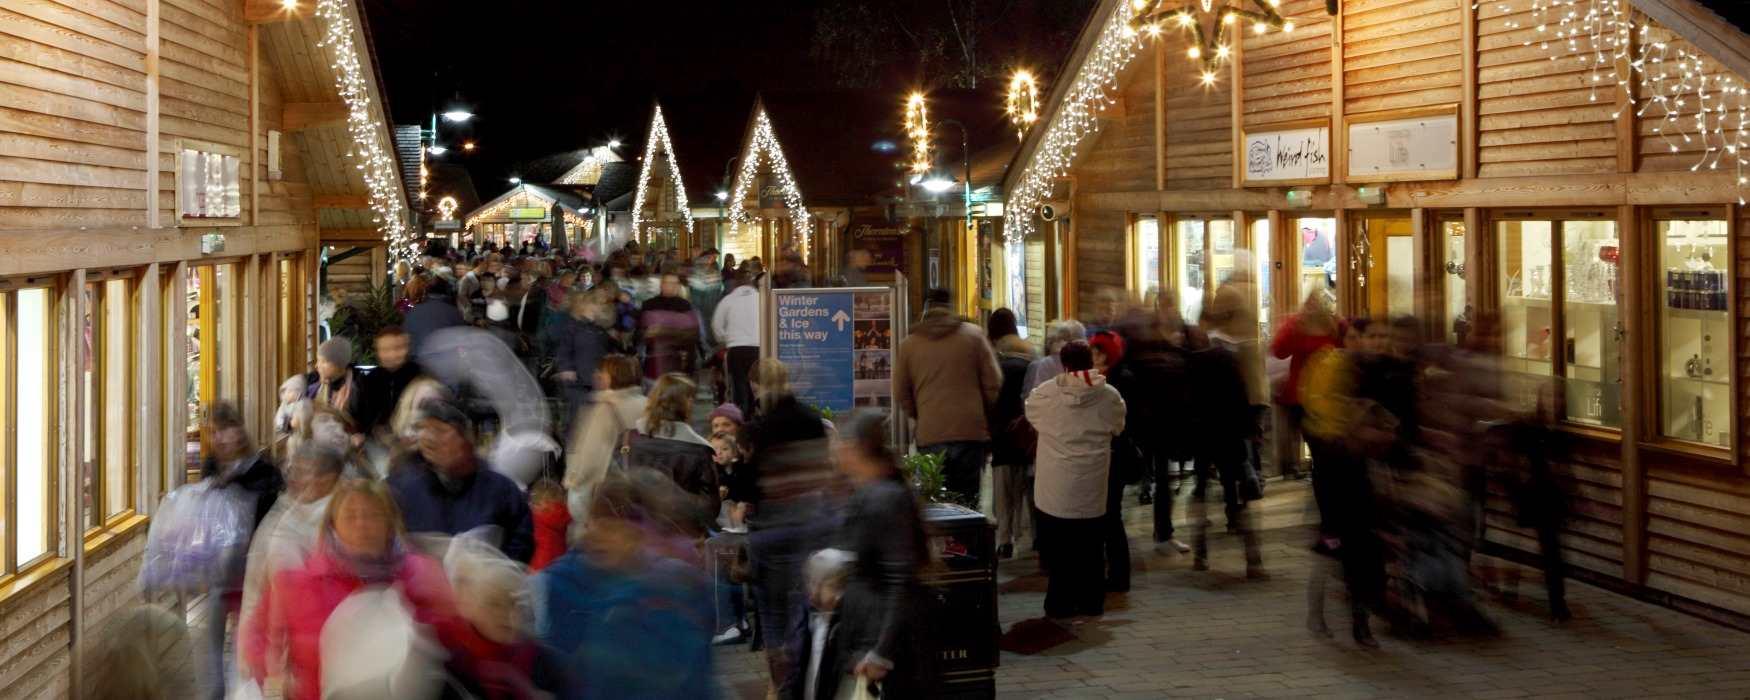 Christmas Shopping at Trentham